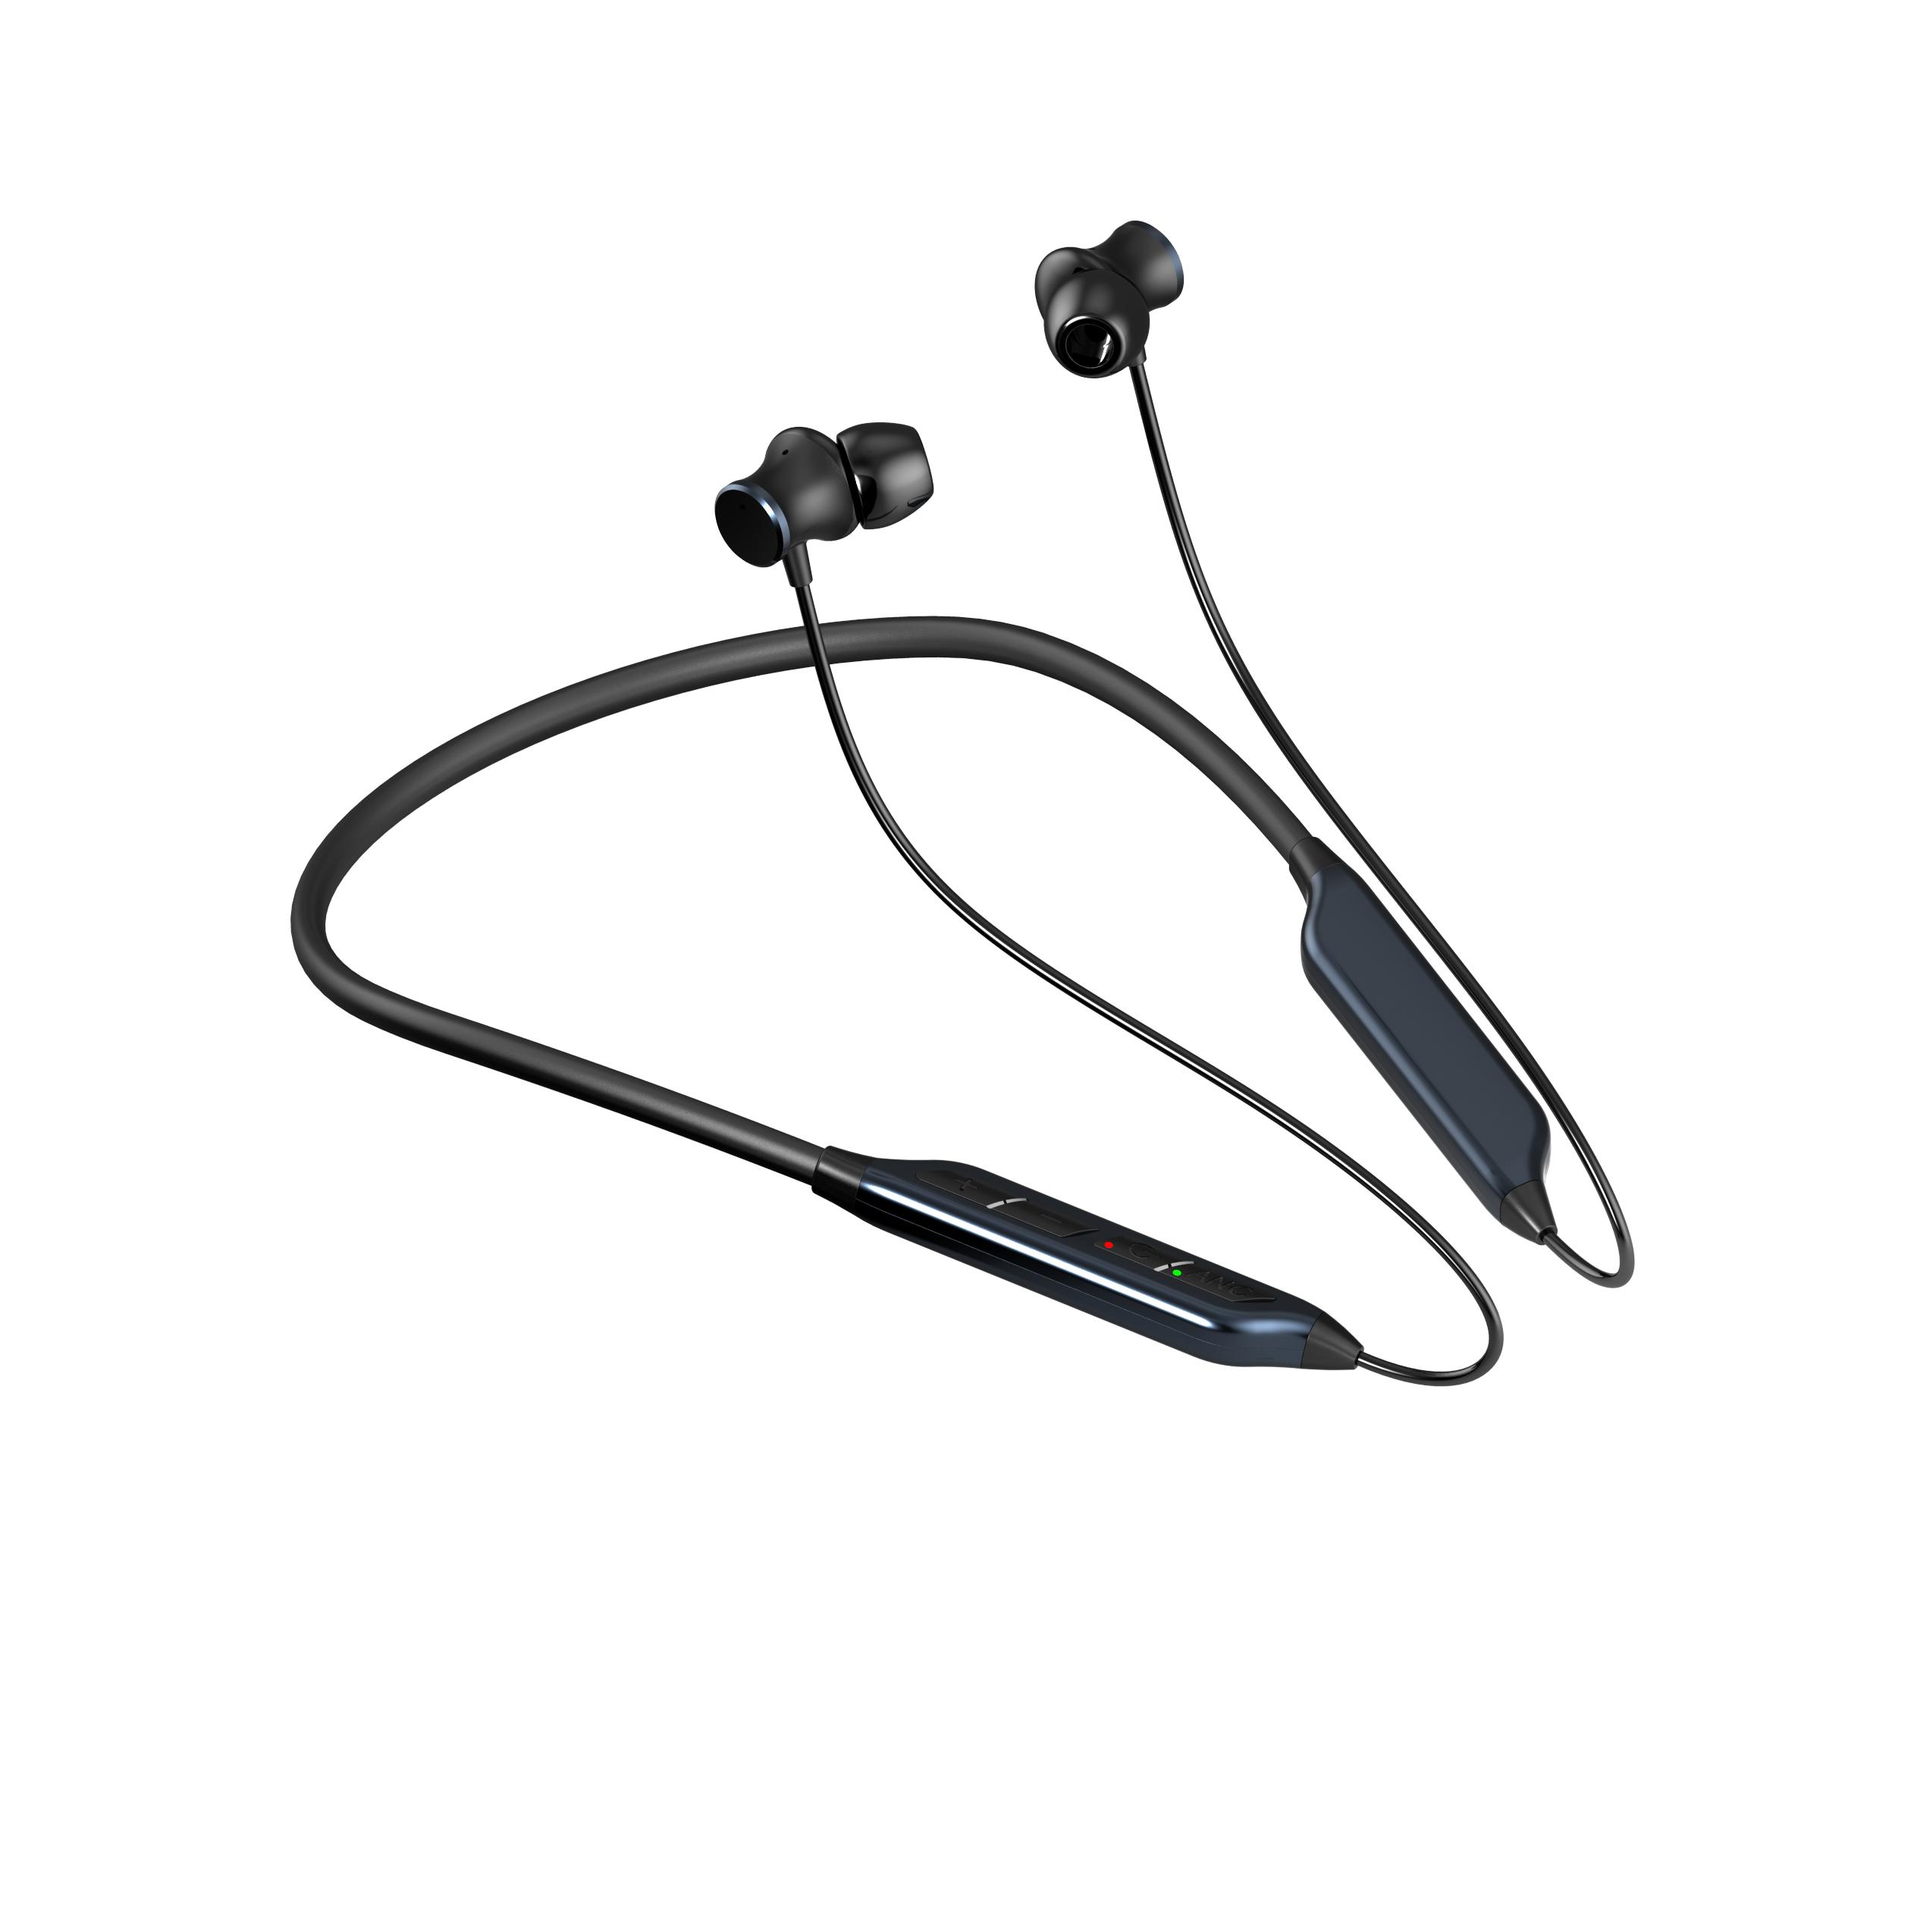 Hot Selling Neck Hanging Super Bass Wireless Earphones Sport Outdoor Portsable Headset TWS Mini Headset Oem